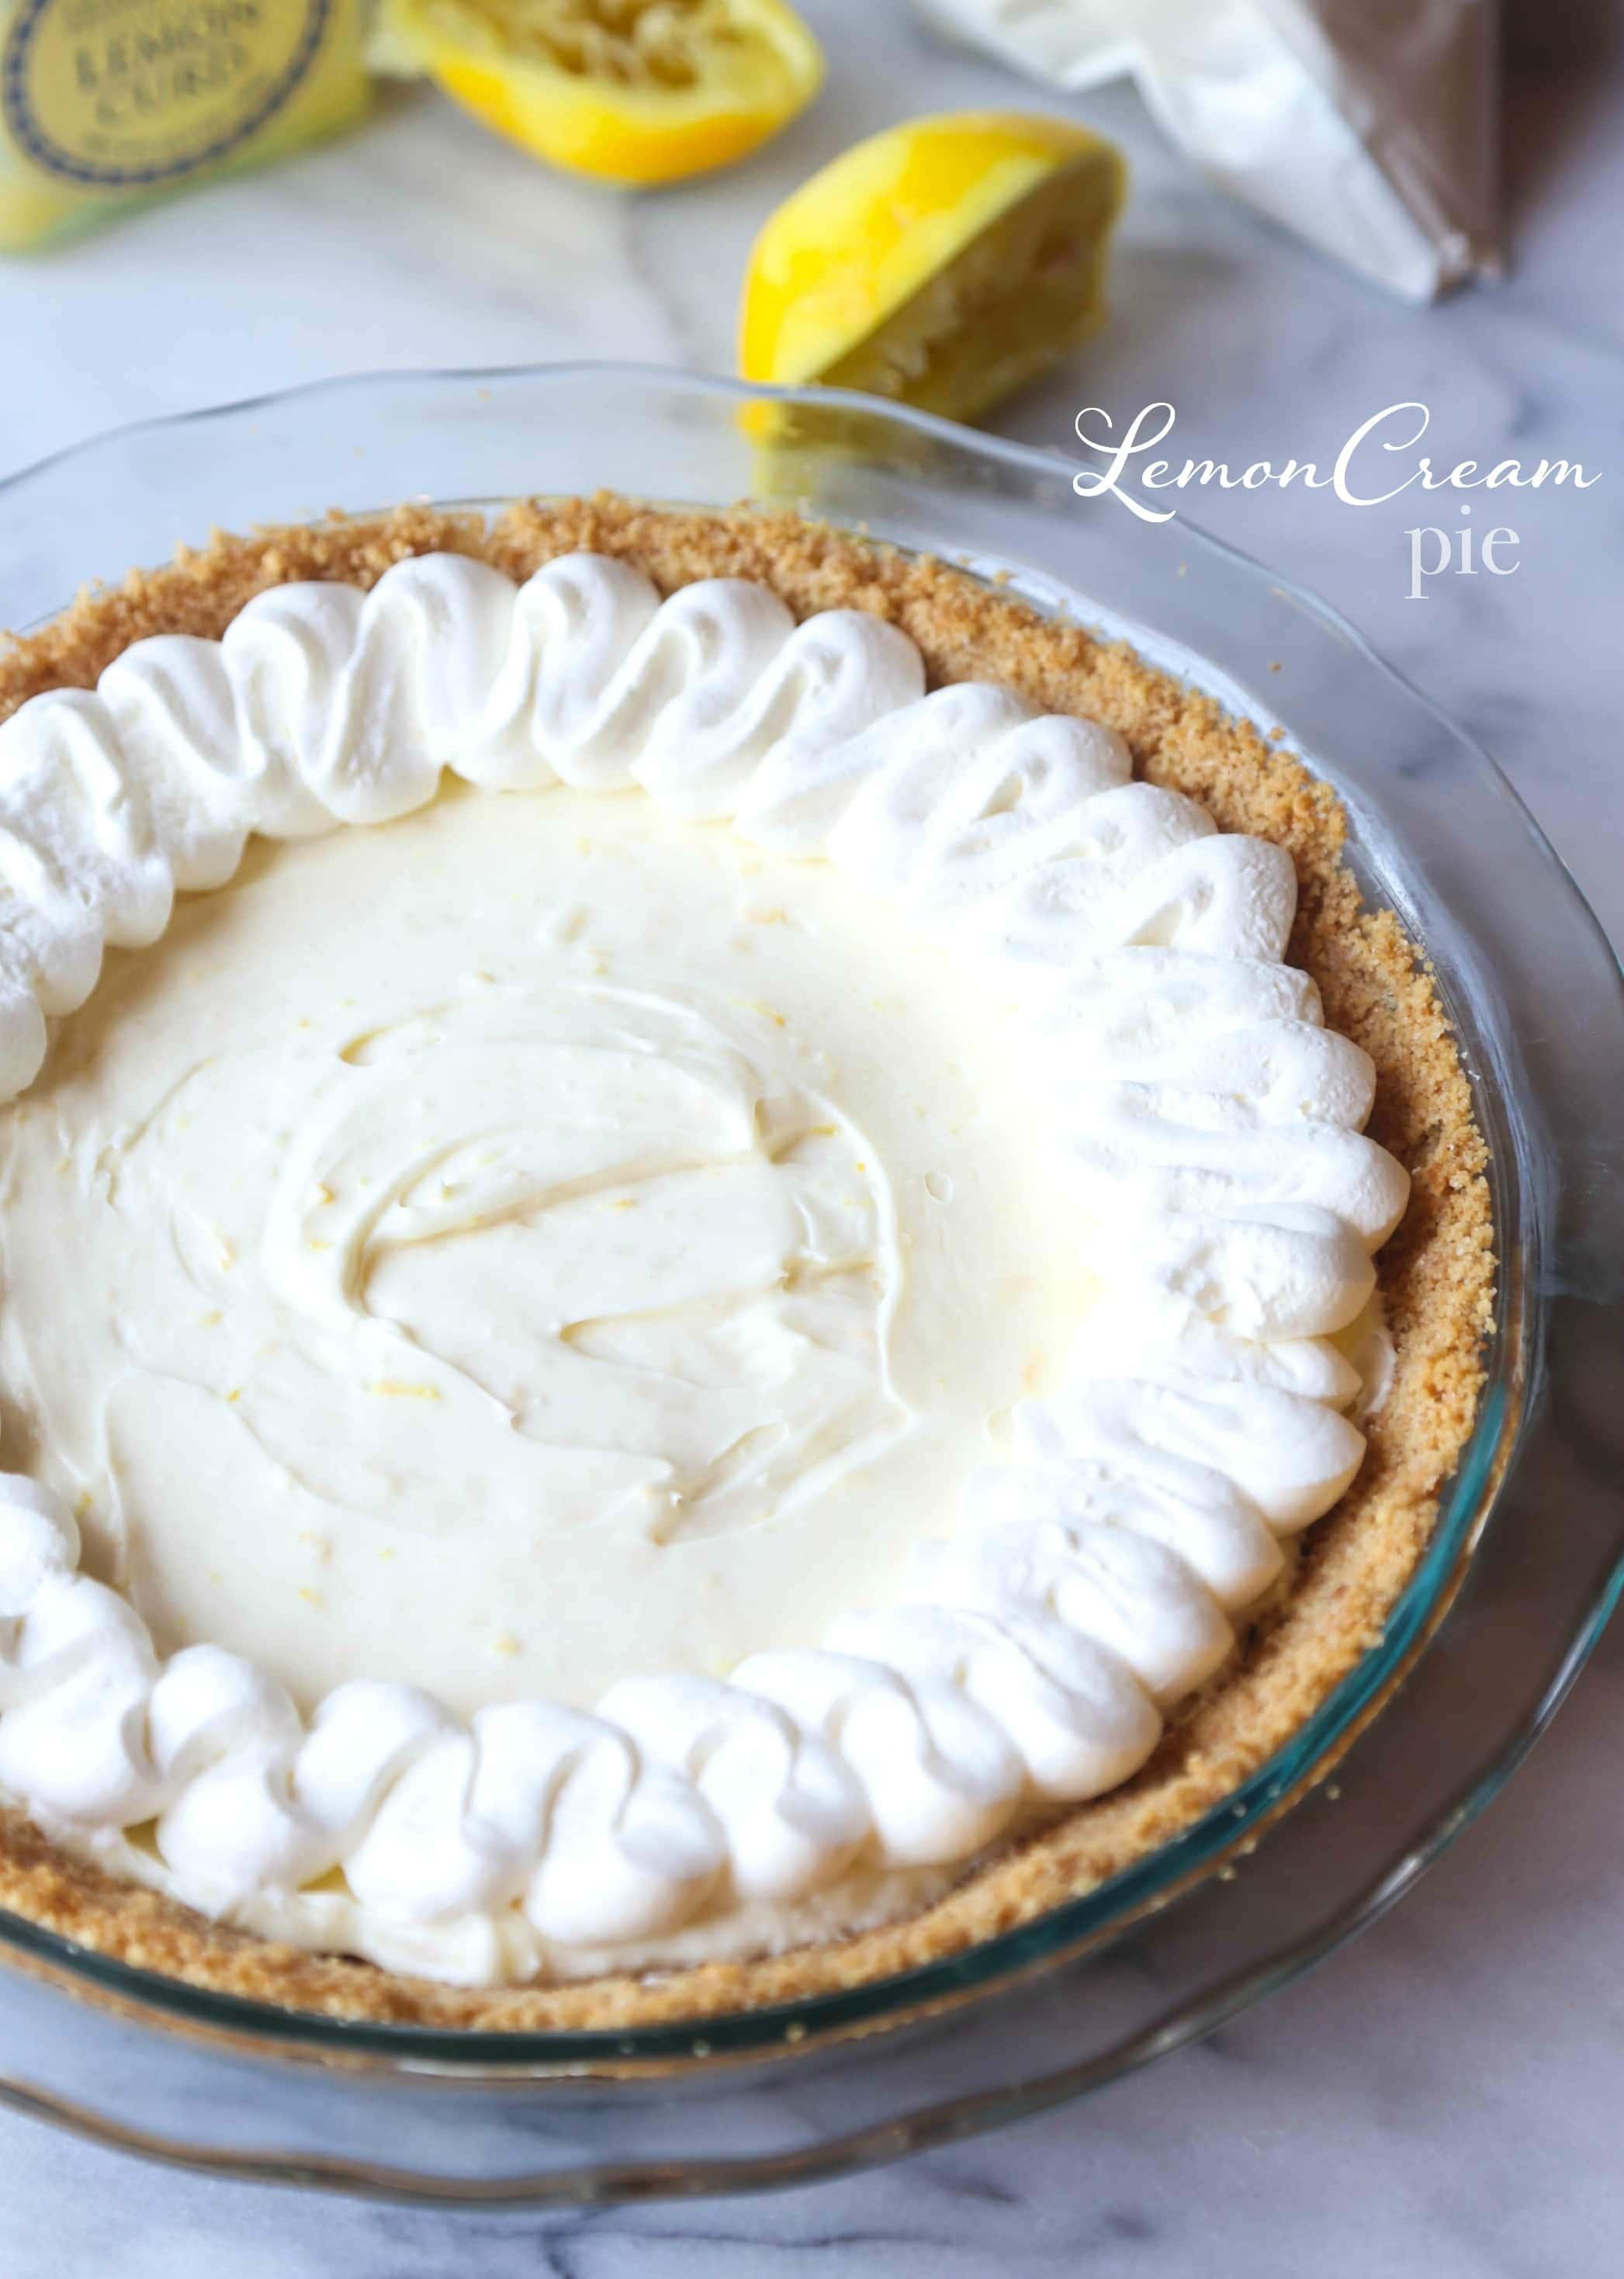 Lemon Cheesecake Pie with Lemon Whipped Cream